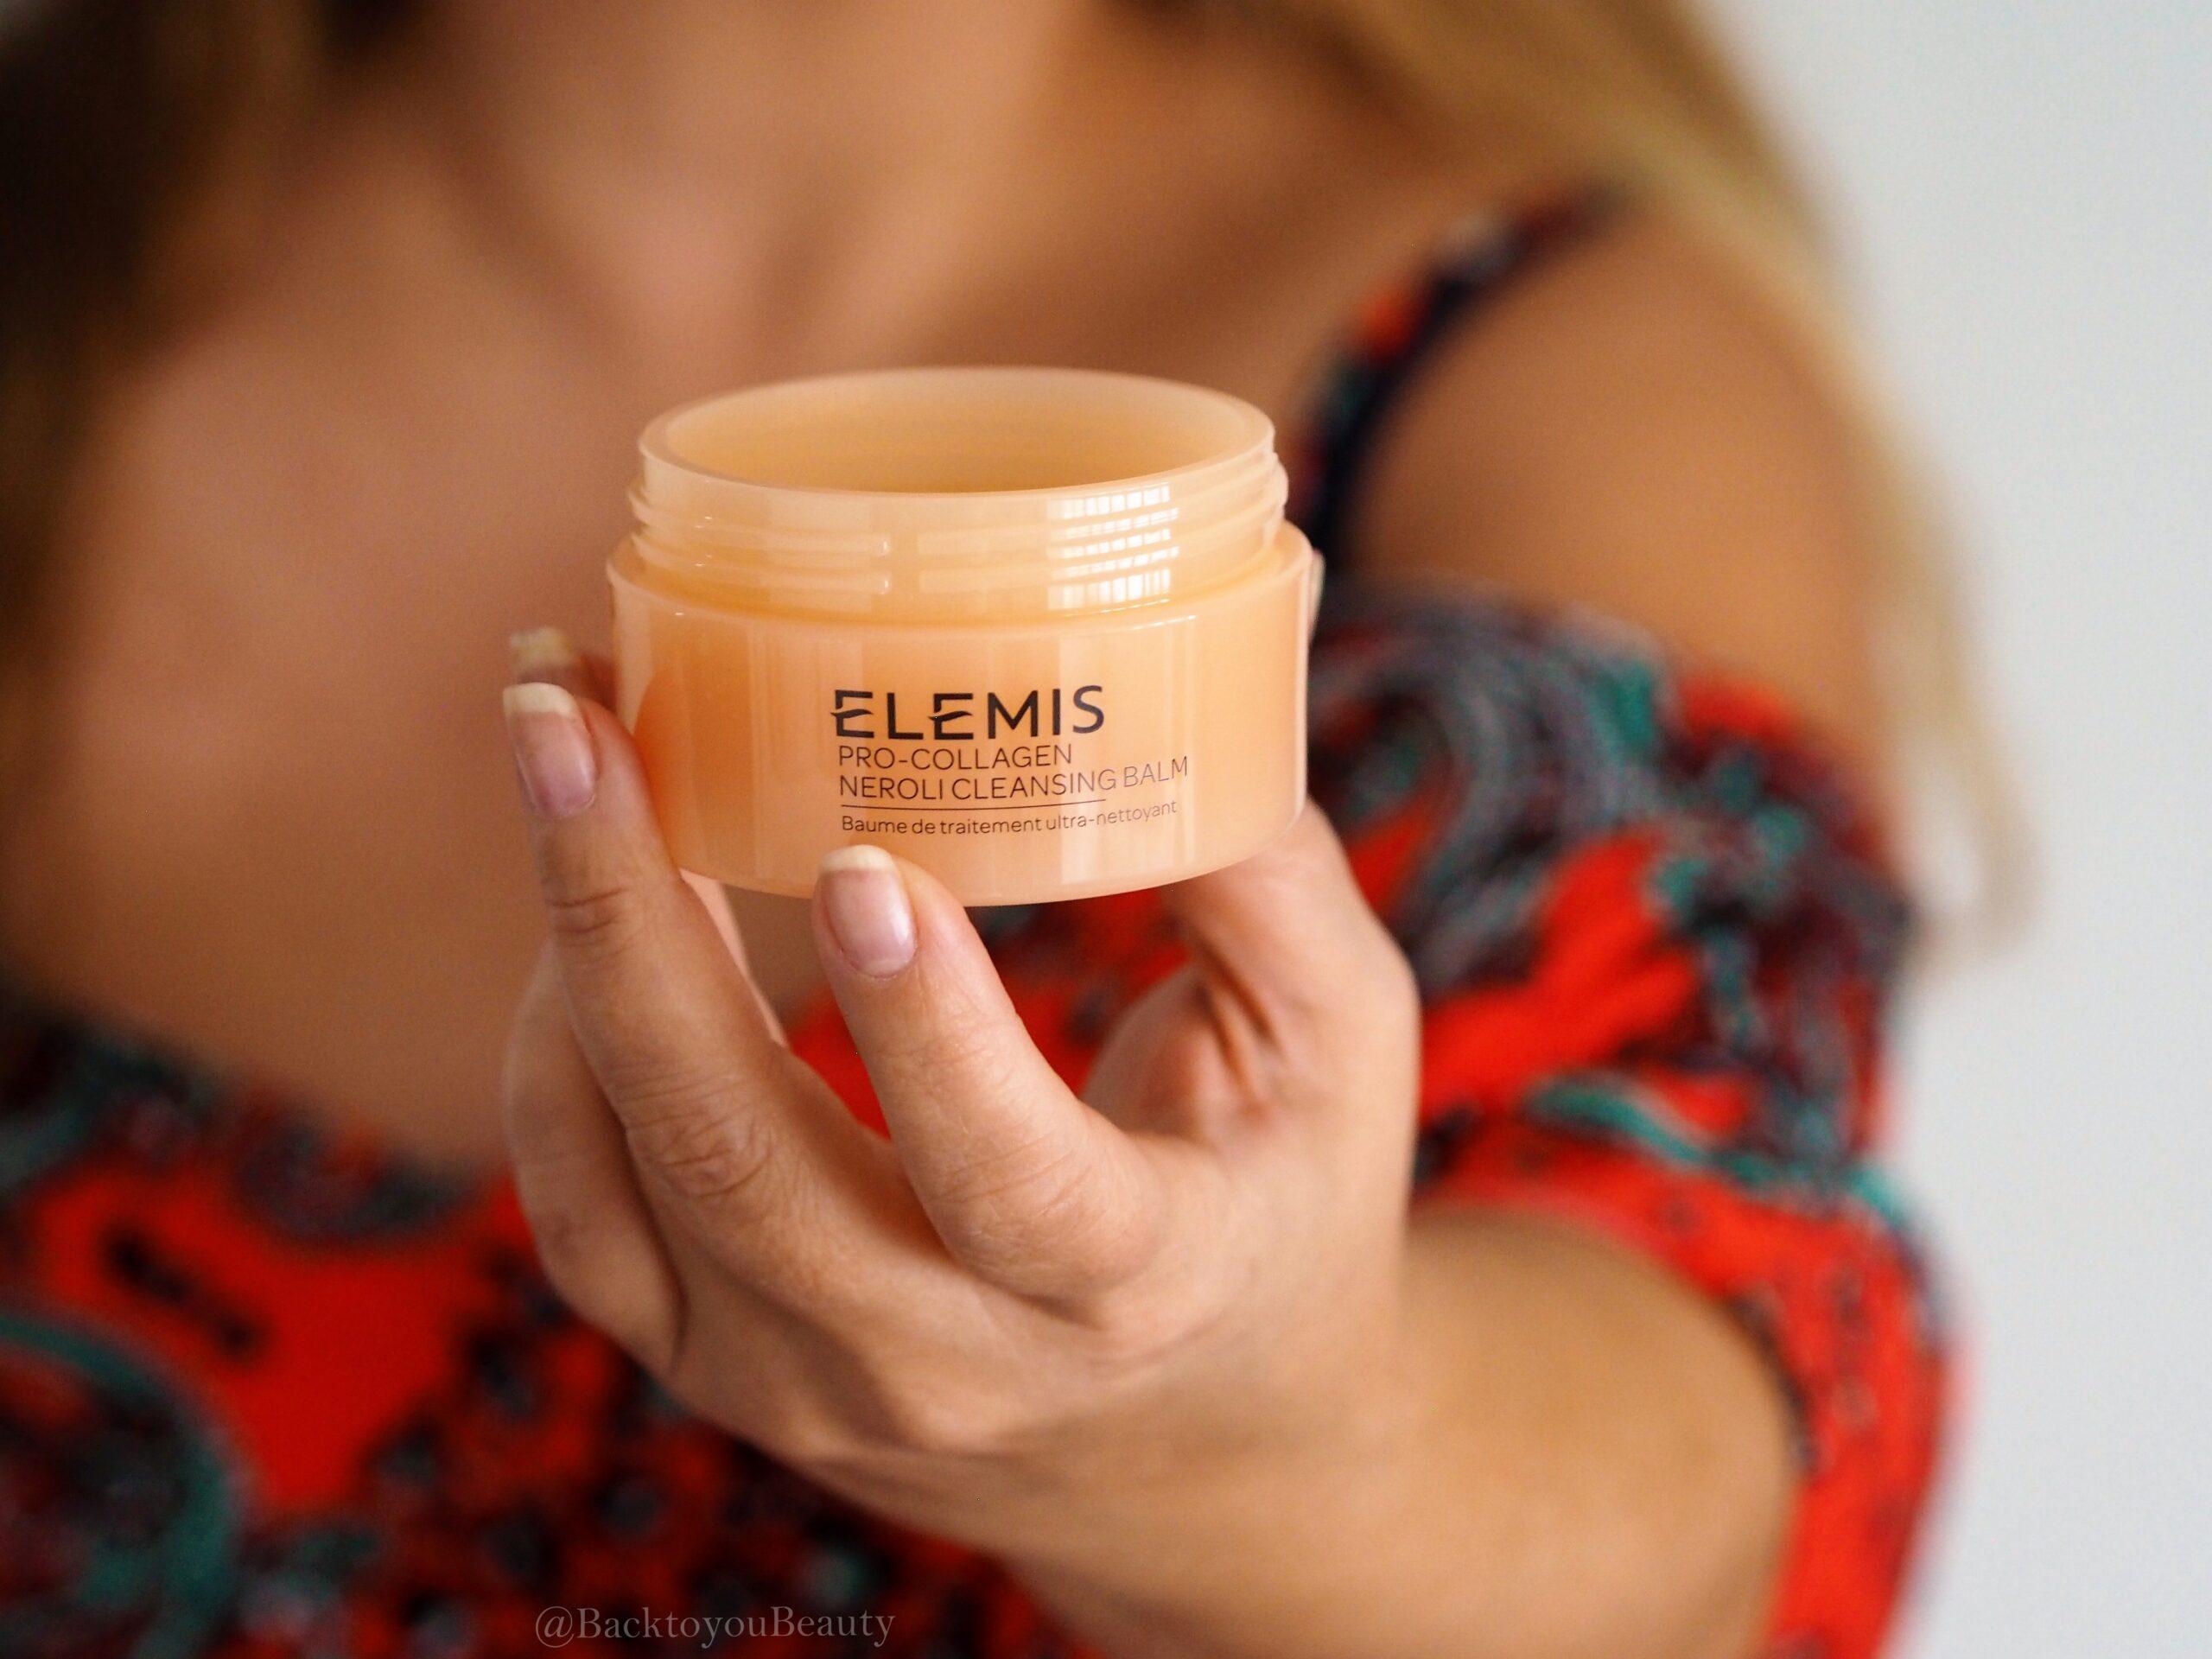 Pro Collagen Neroli Cleansing Balm